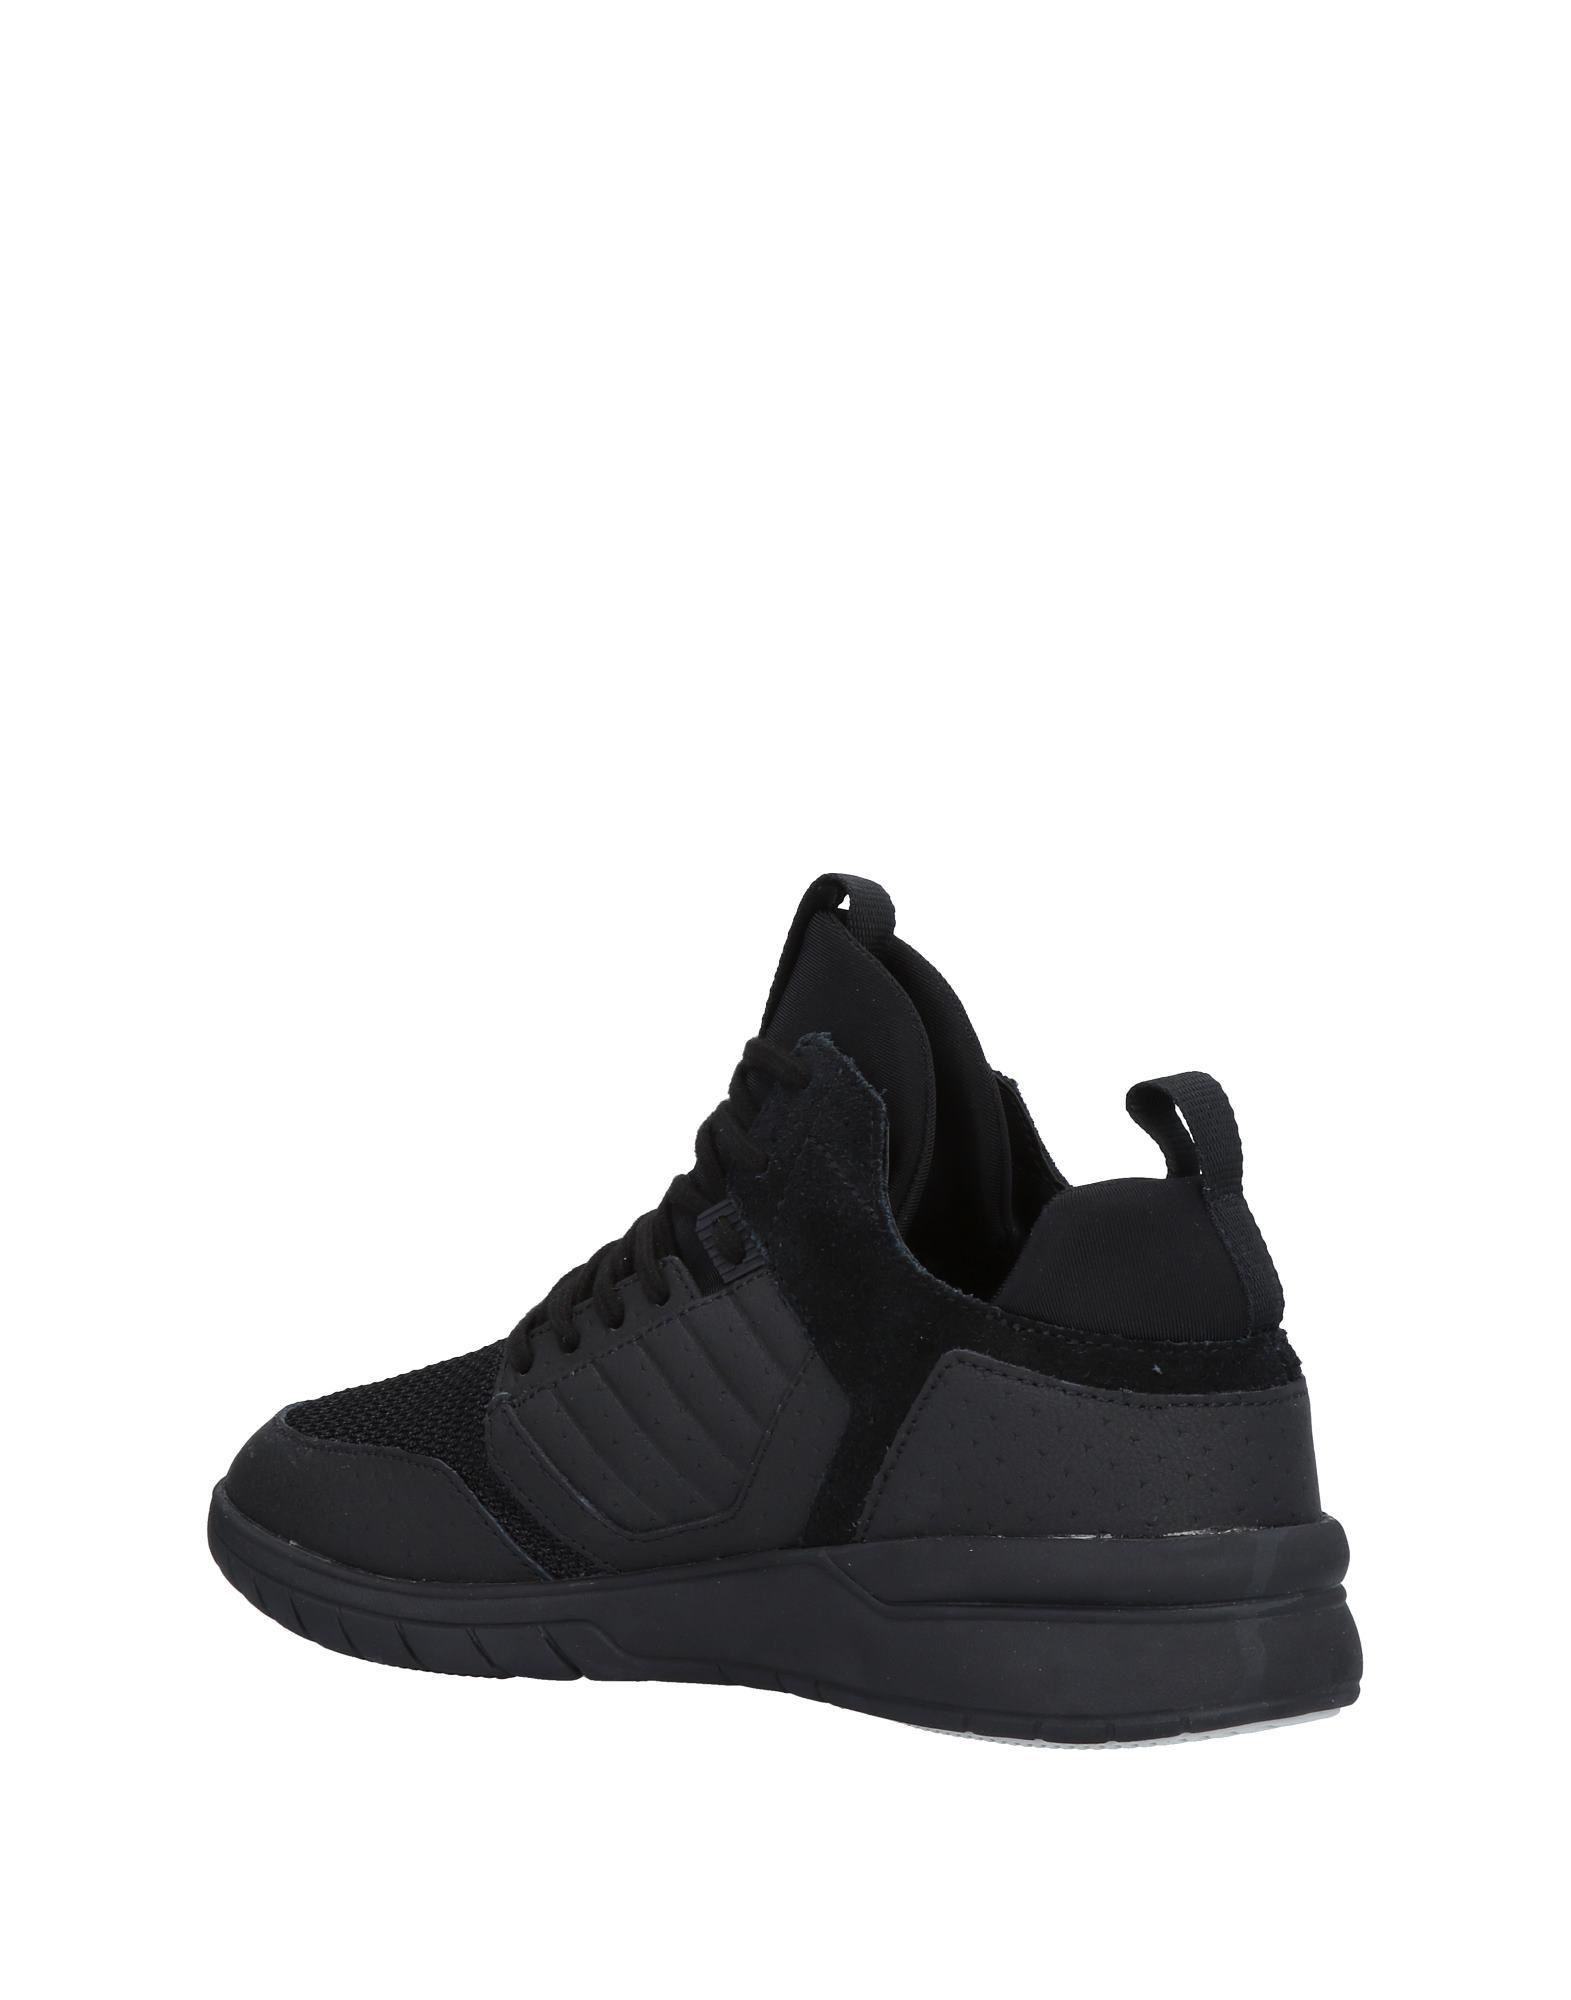 8e7f913891 Supra Low-tops & Sneakers in Black for Men - Lyst